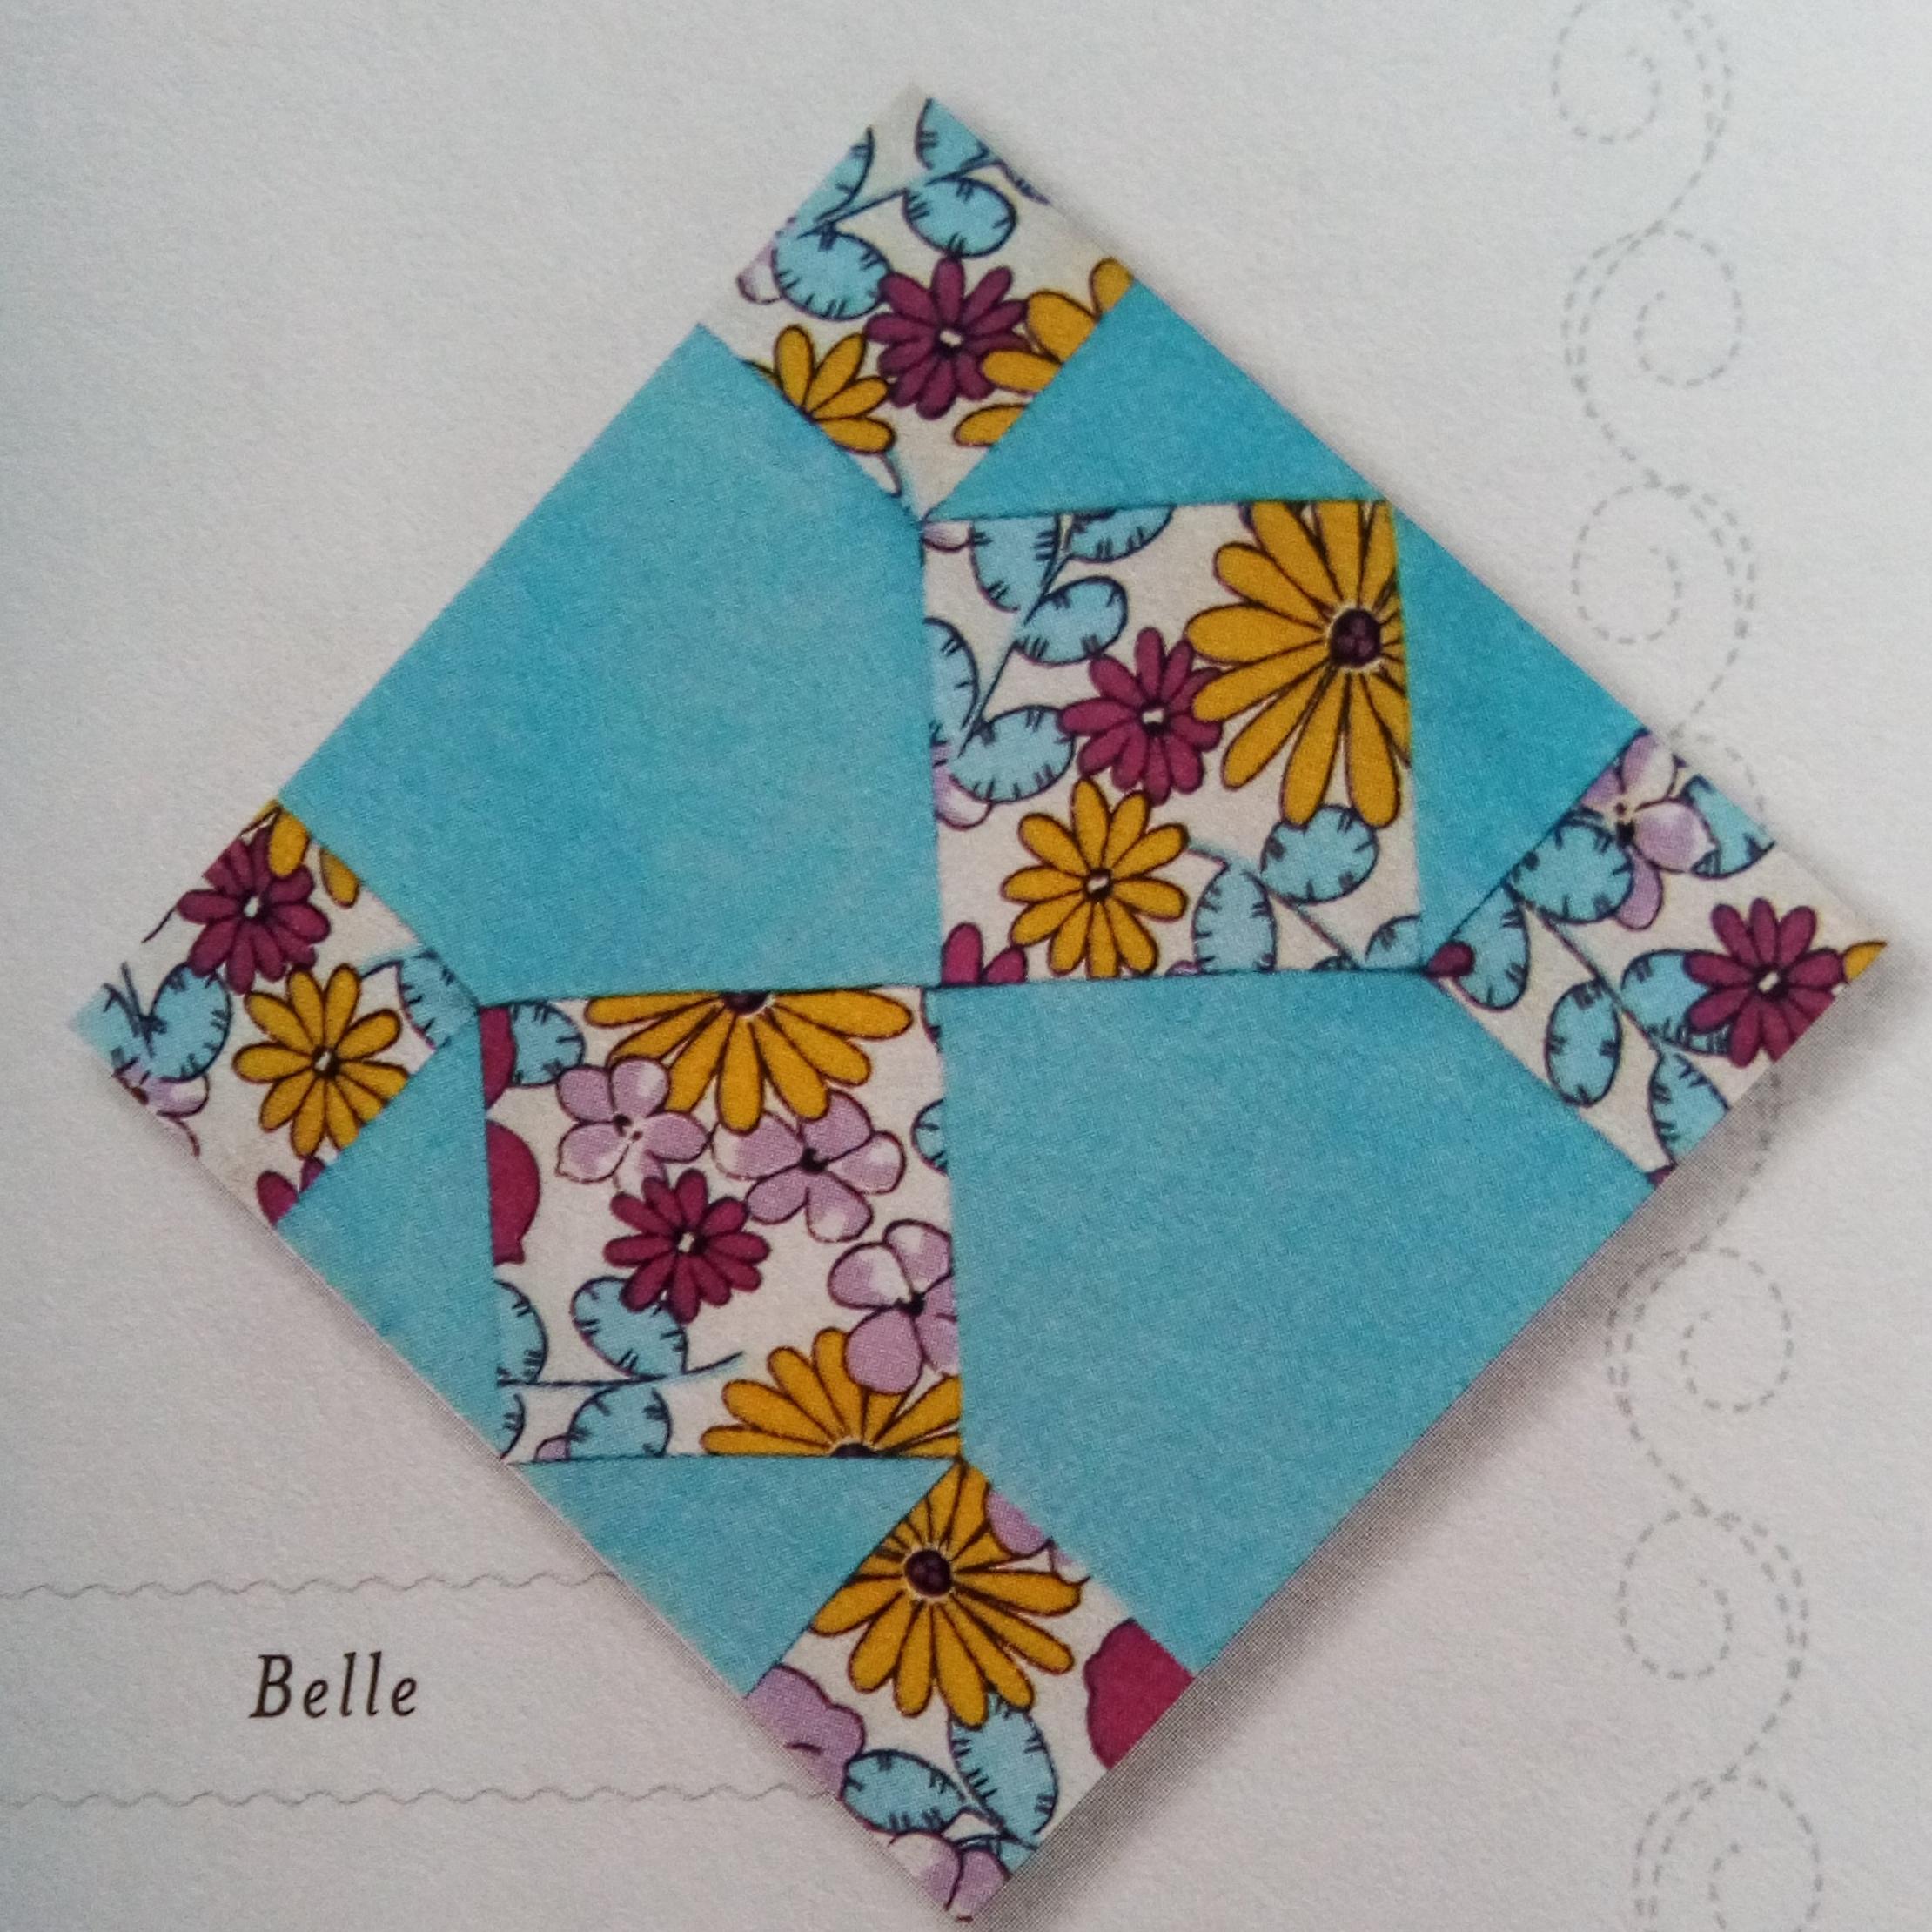 Belle: Coming December 17